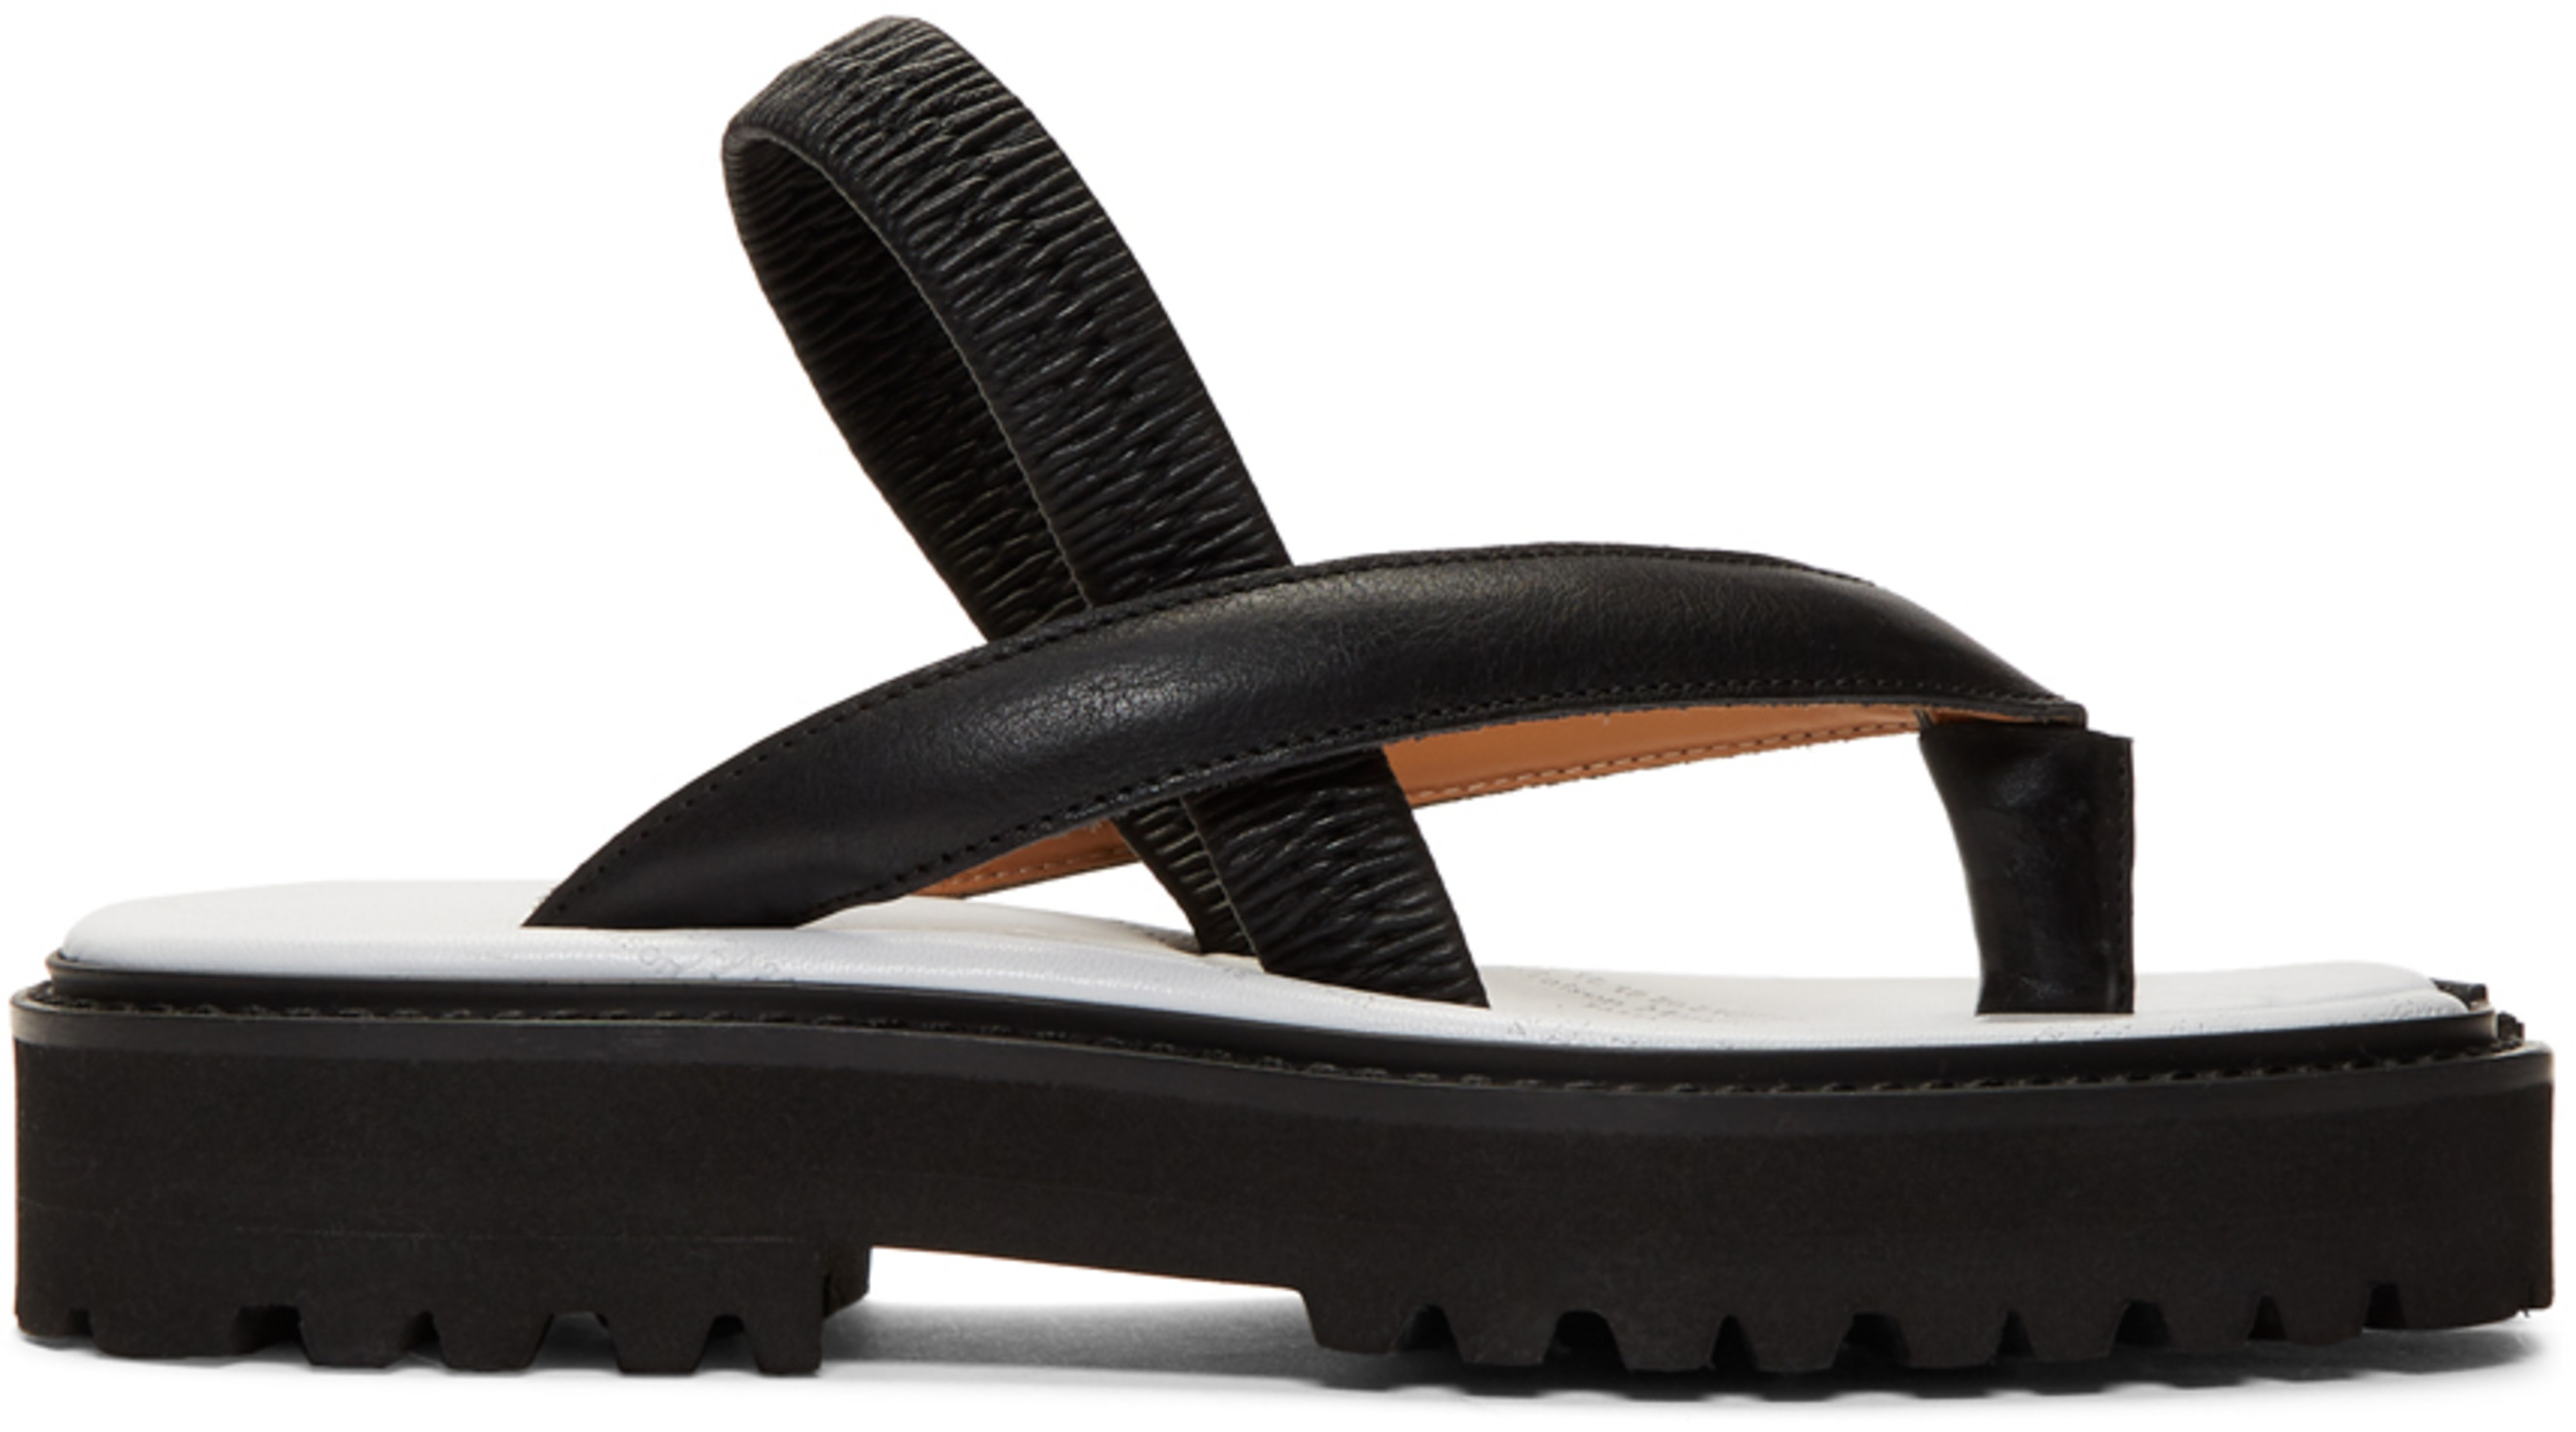 ca4cbba0bde Designer sandals for Women